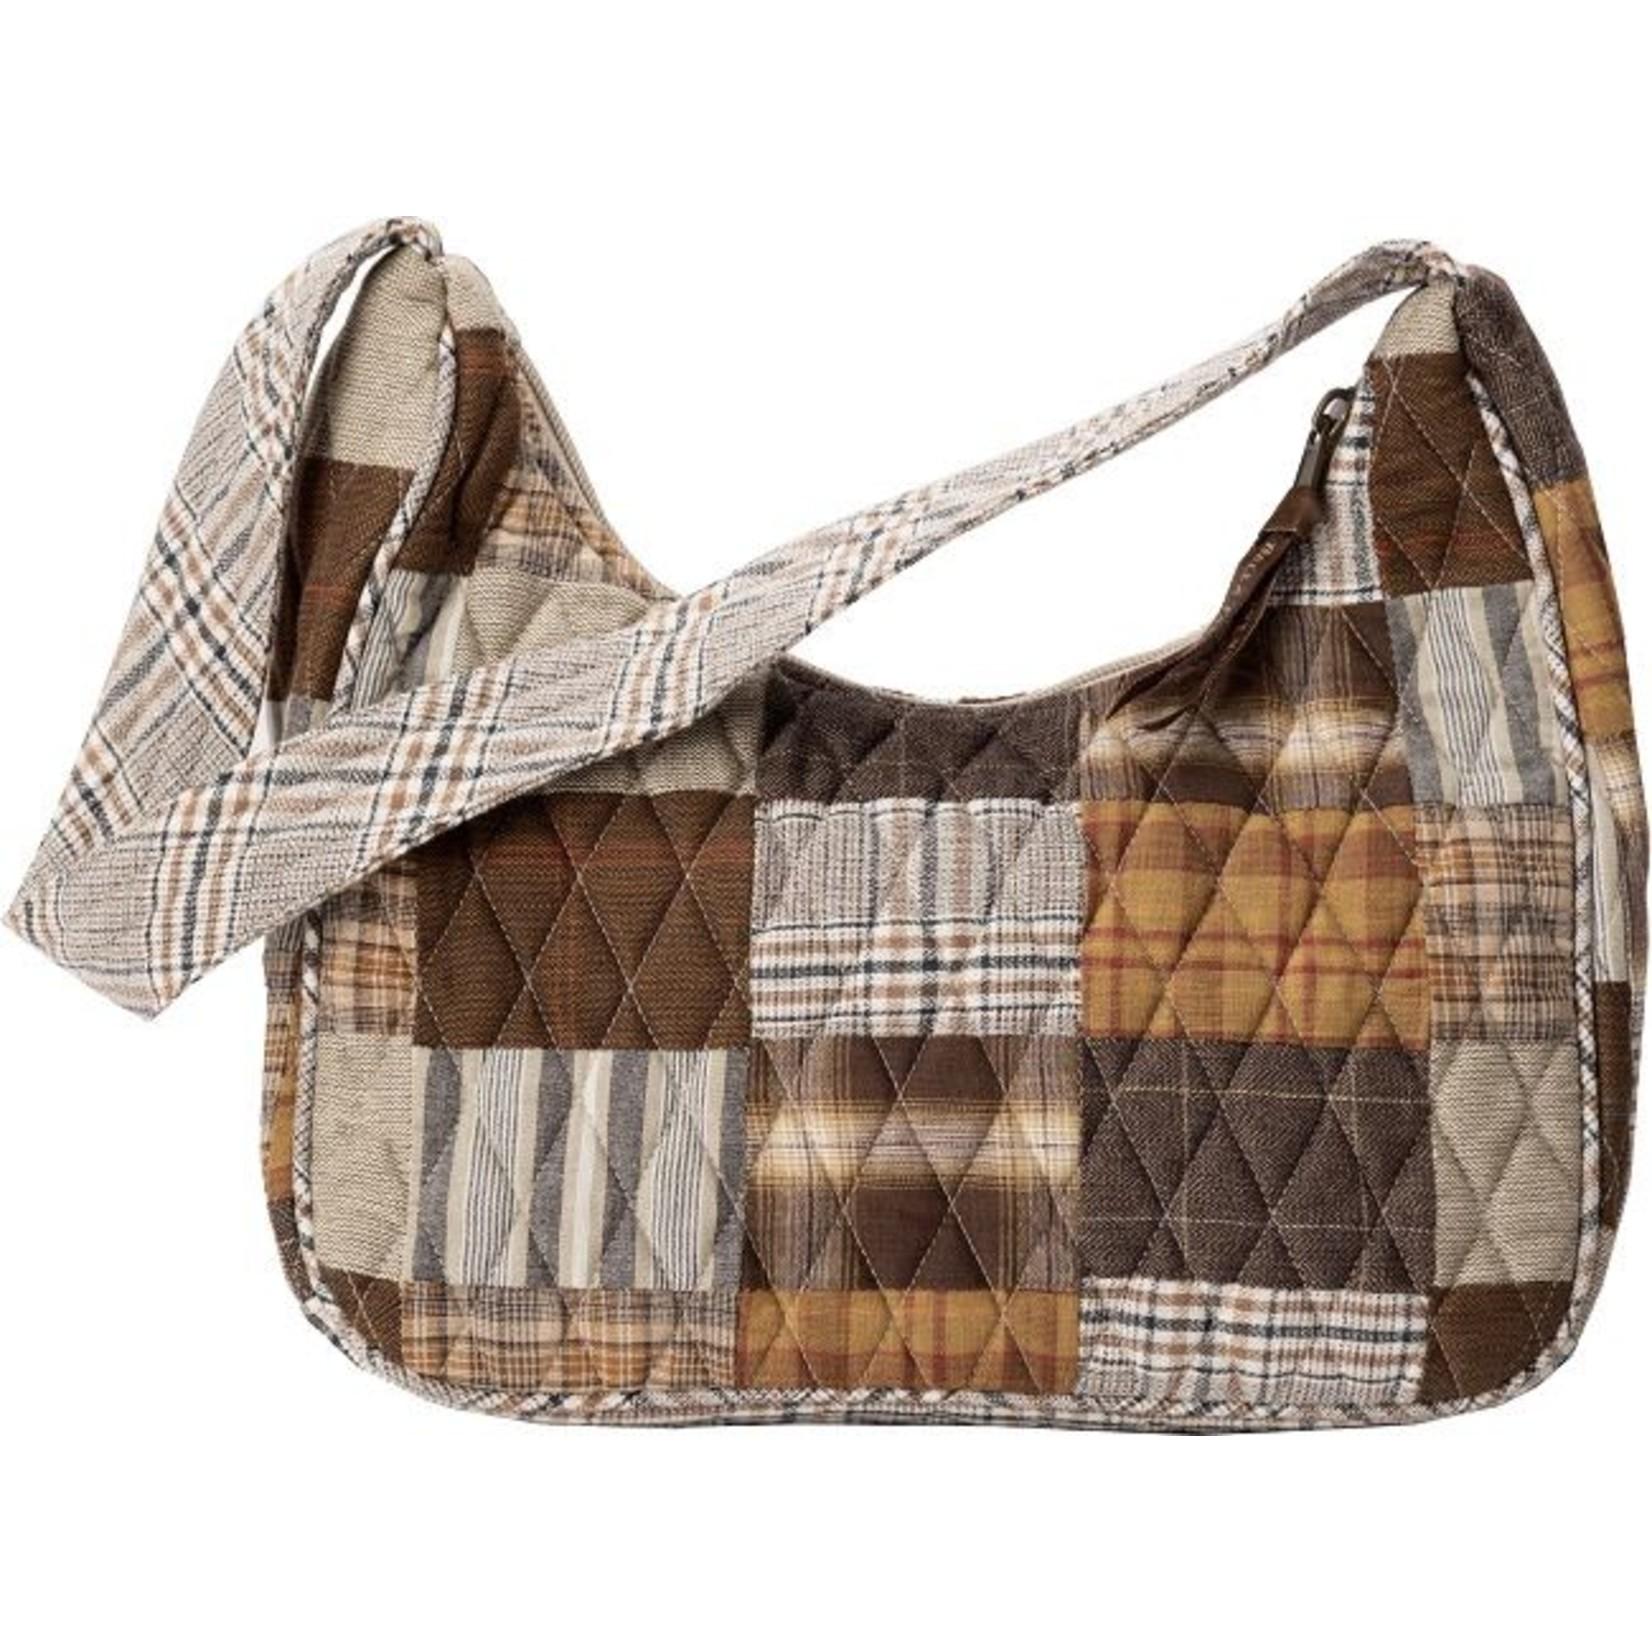 Bella Taylor Rory - Blakely handbag